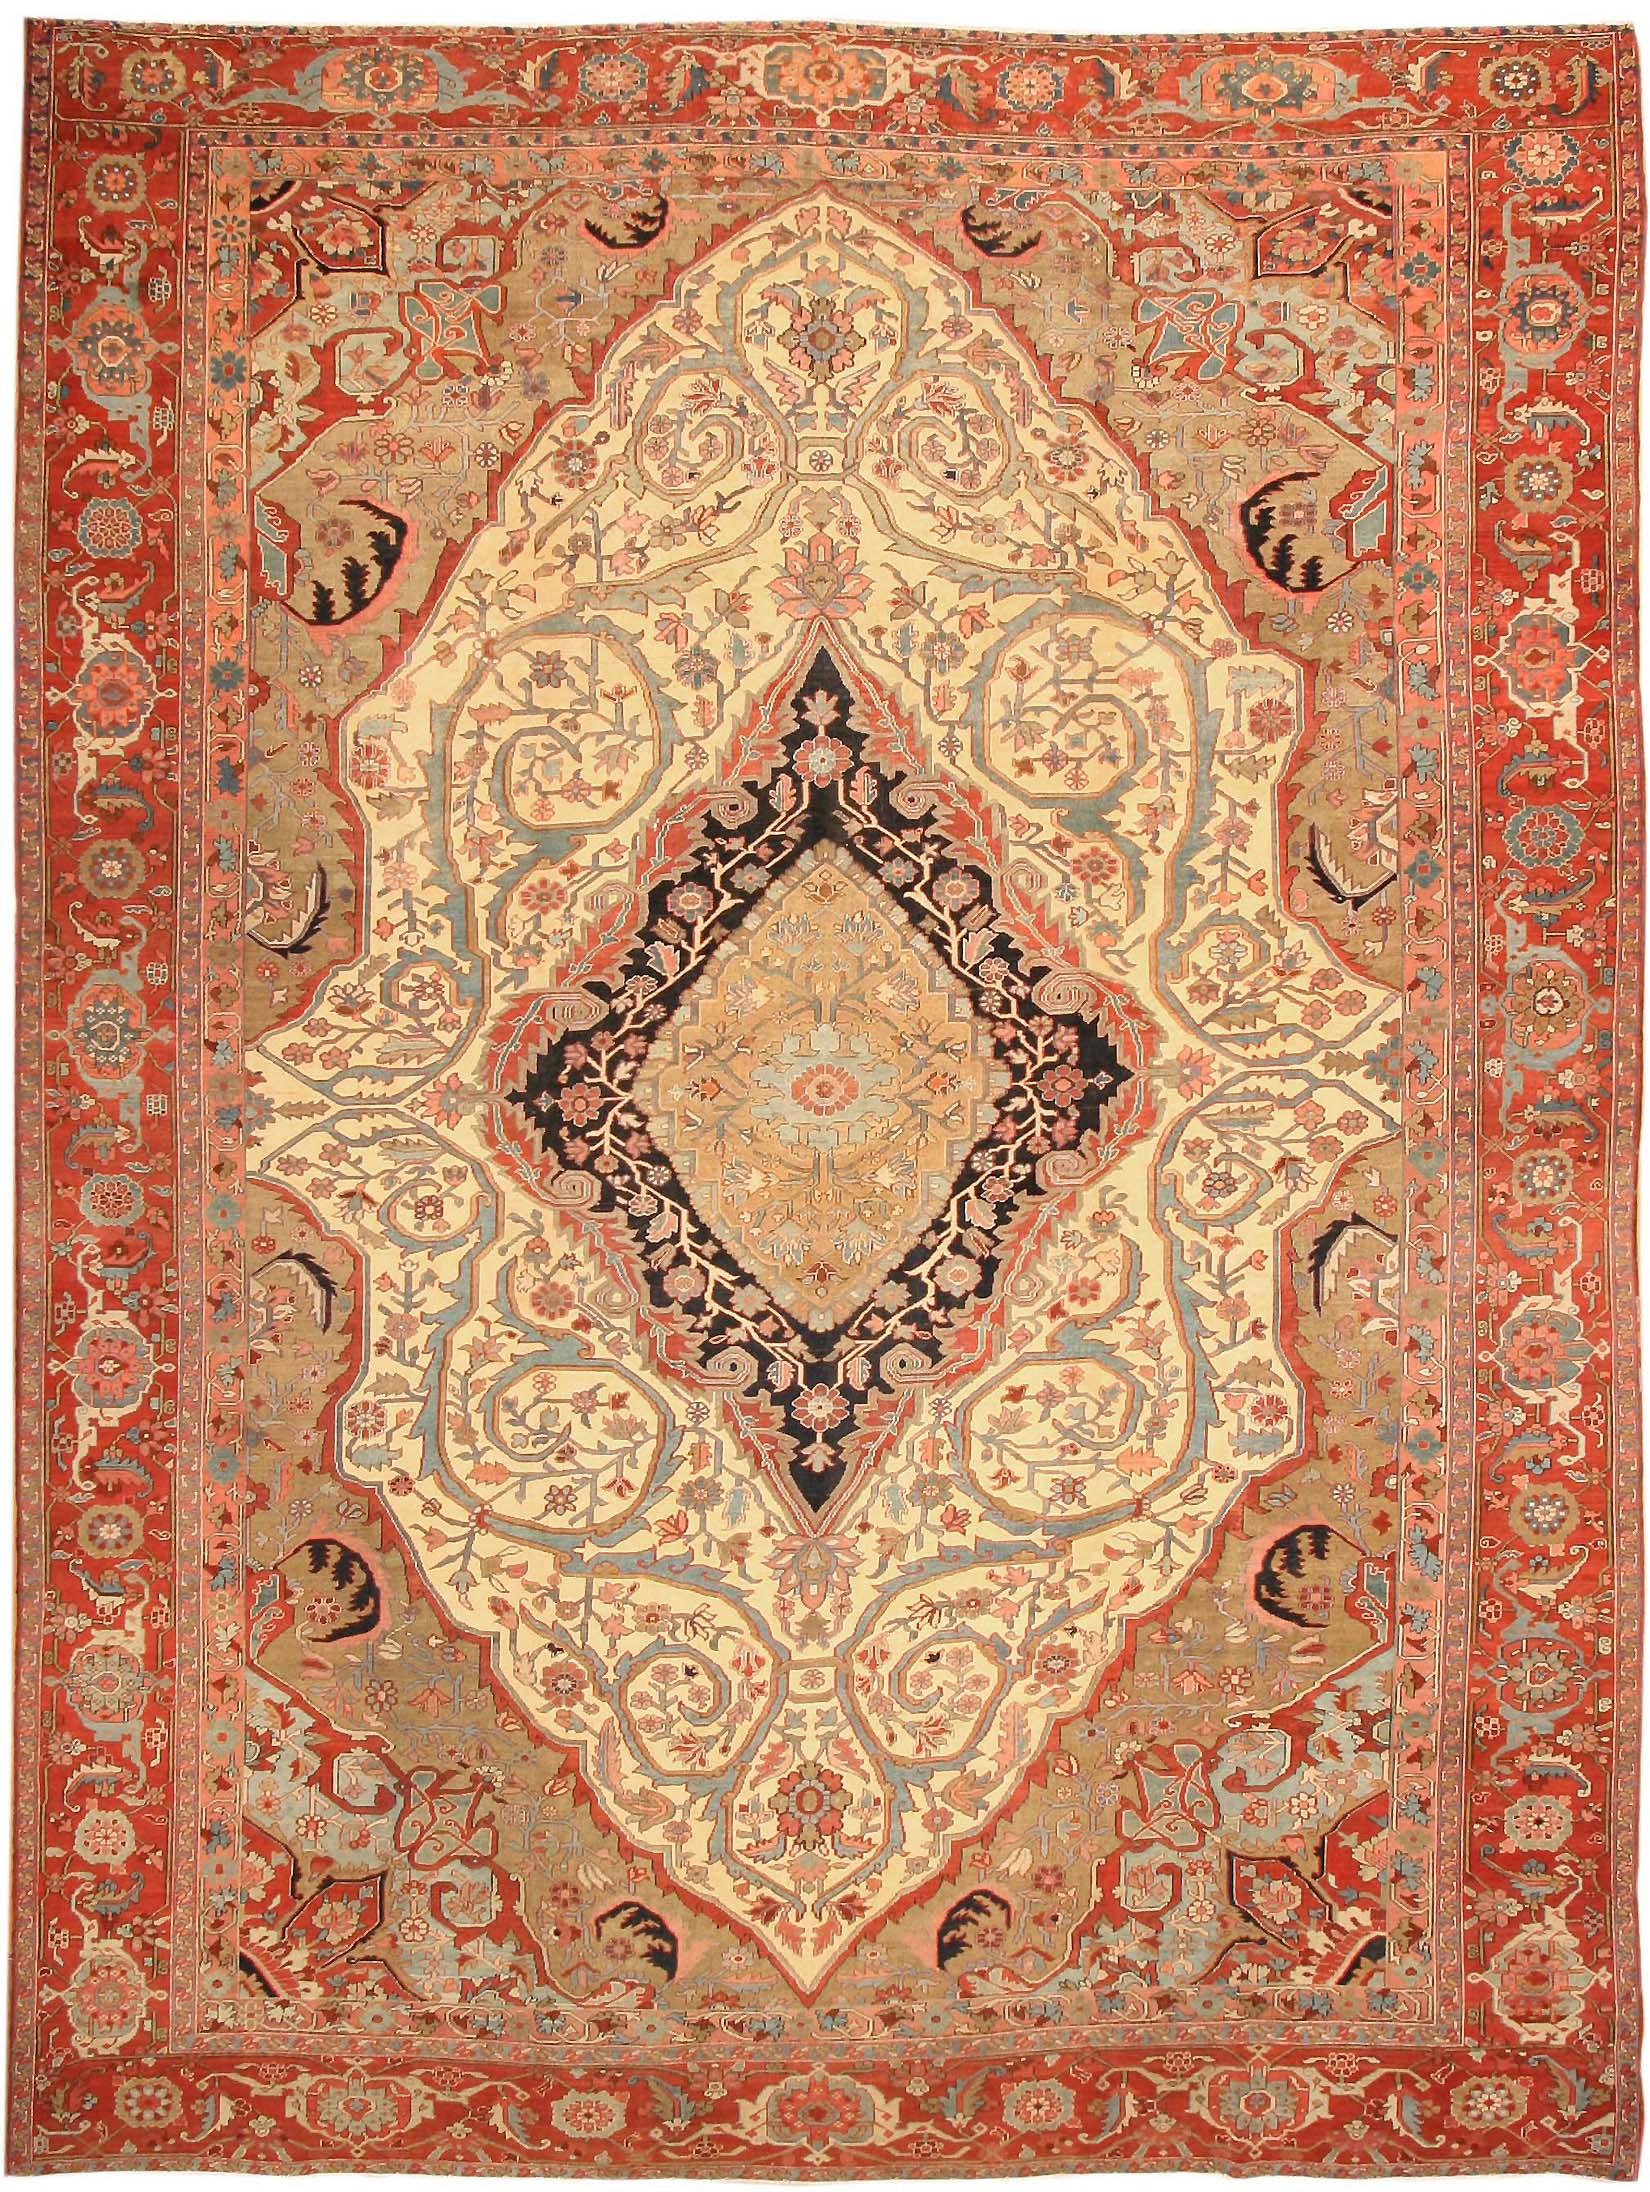 Carpet clipart rug persian. Colorful